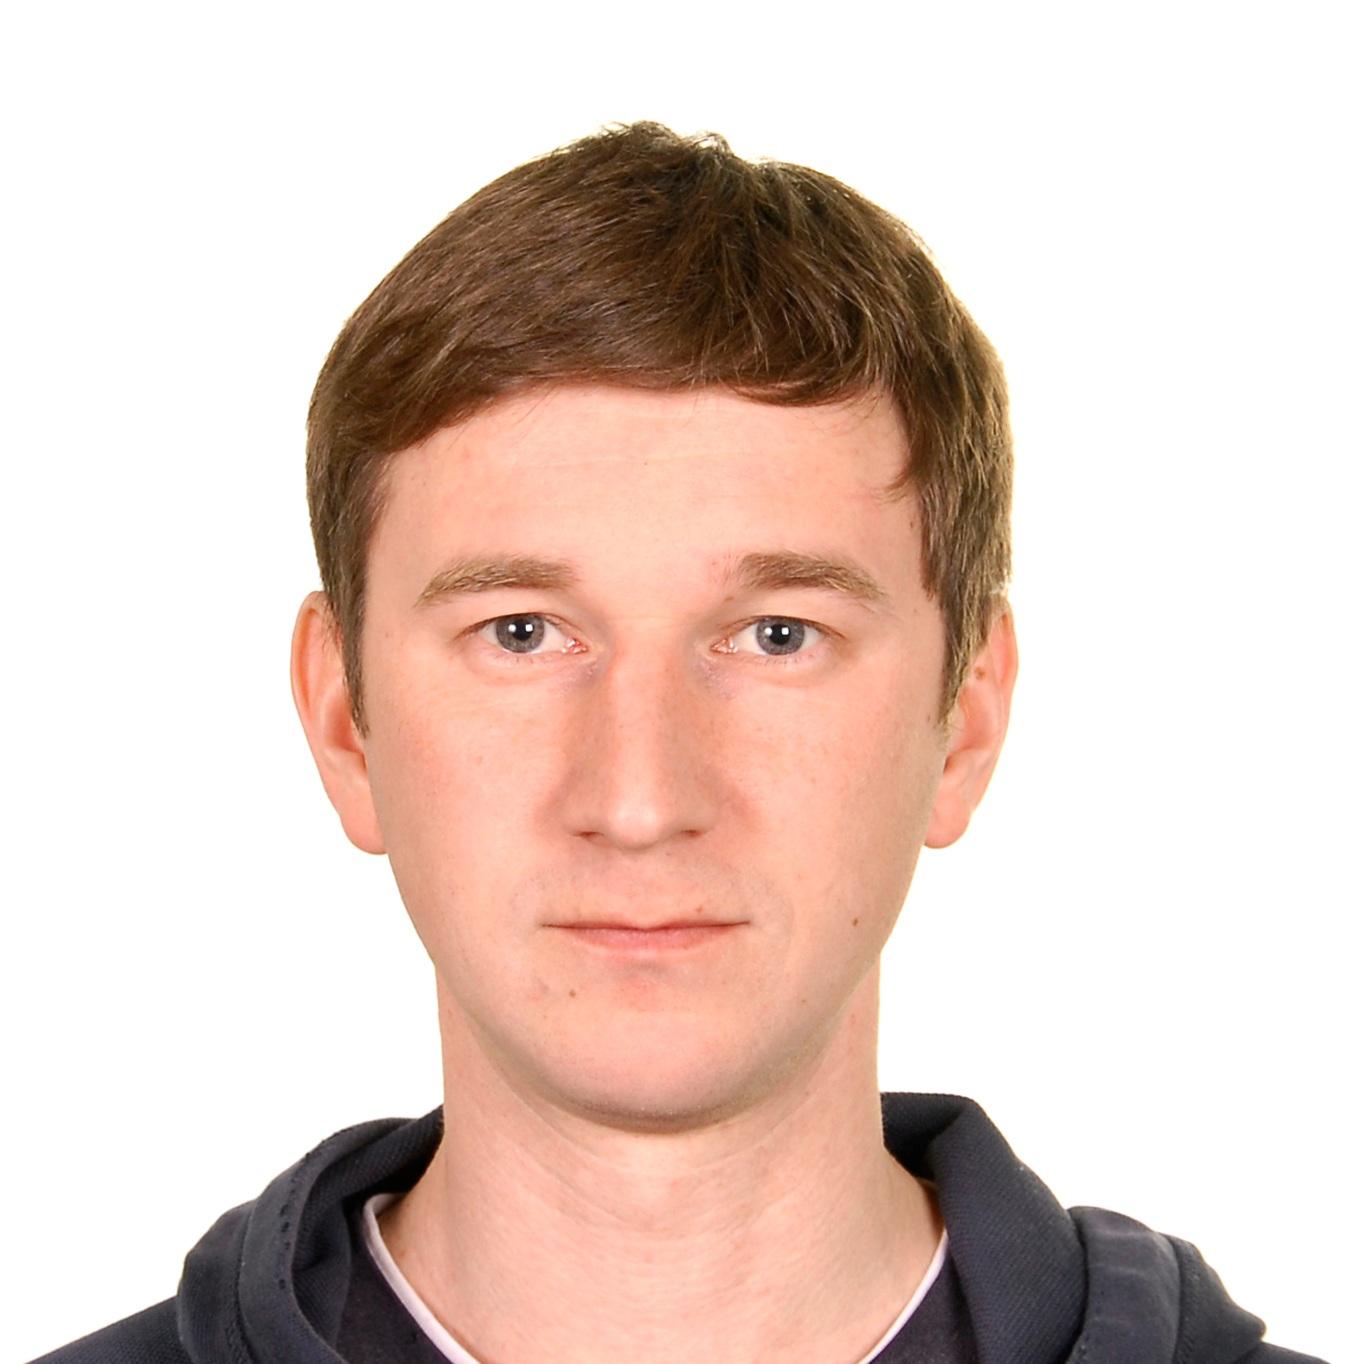 ALEXEY MALGAVKO Omsk, Russia @EverydayRussia  @malgavko